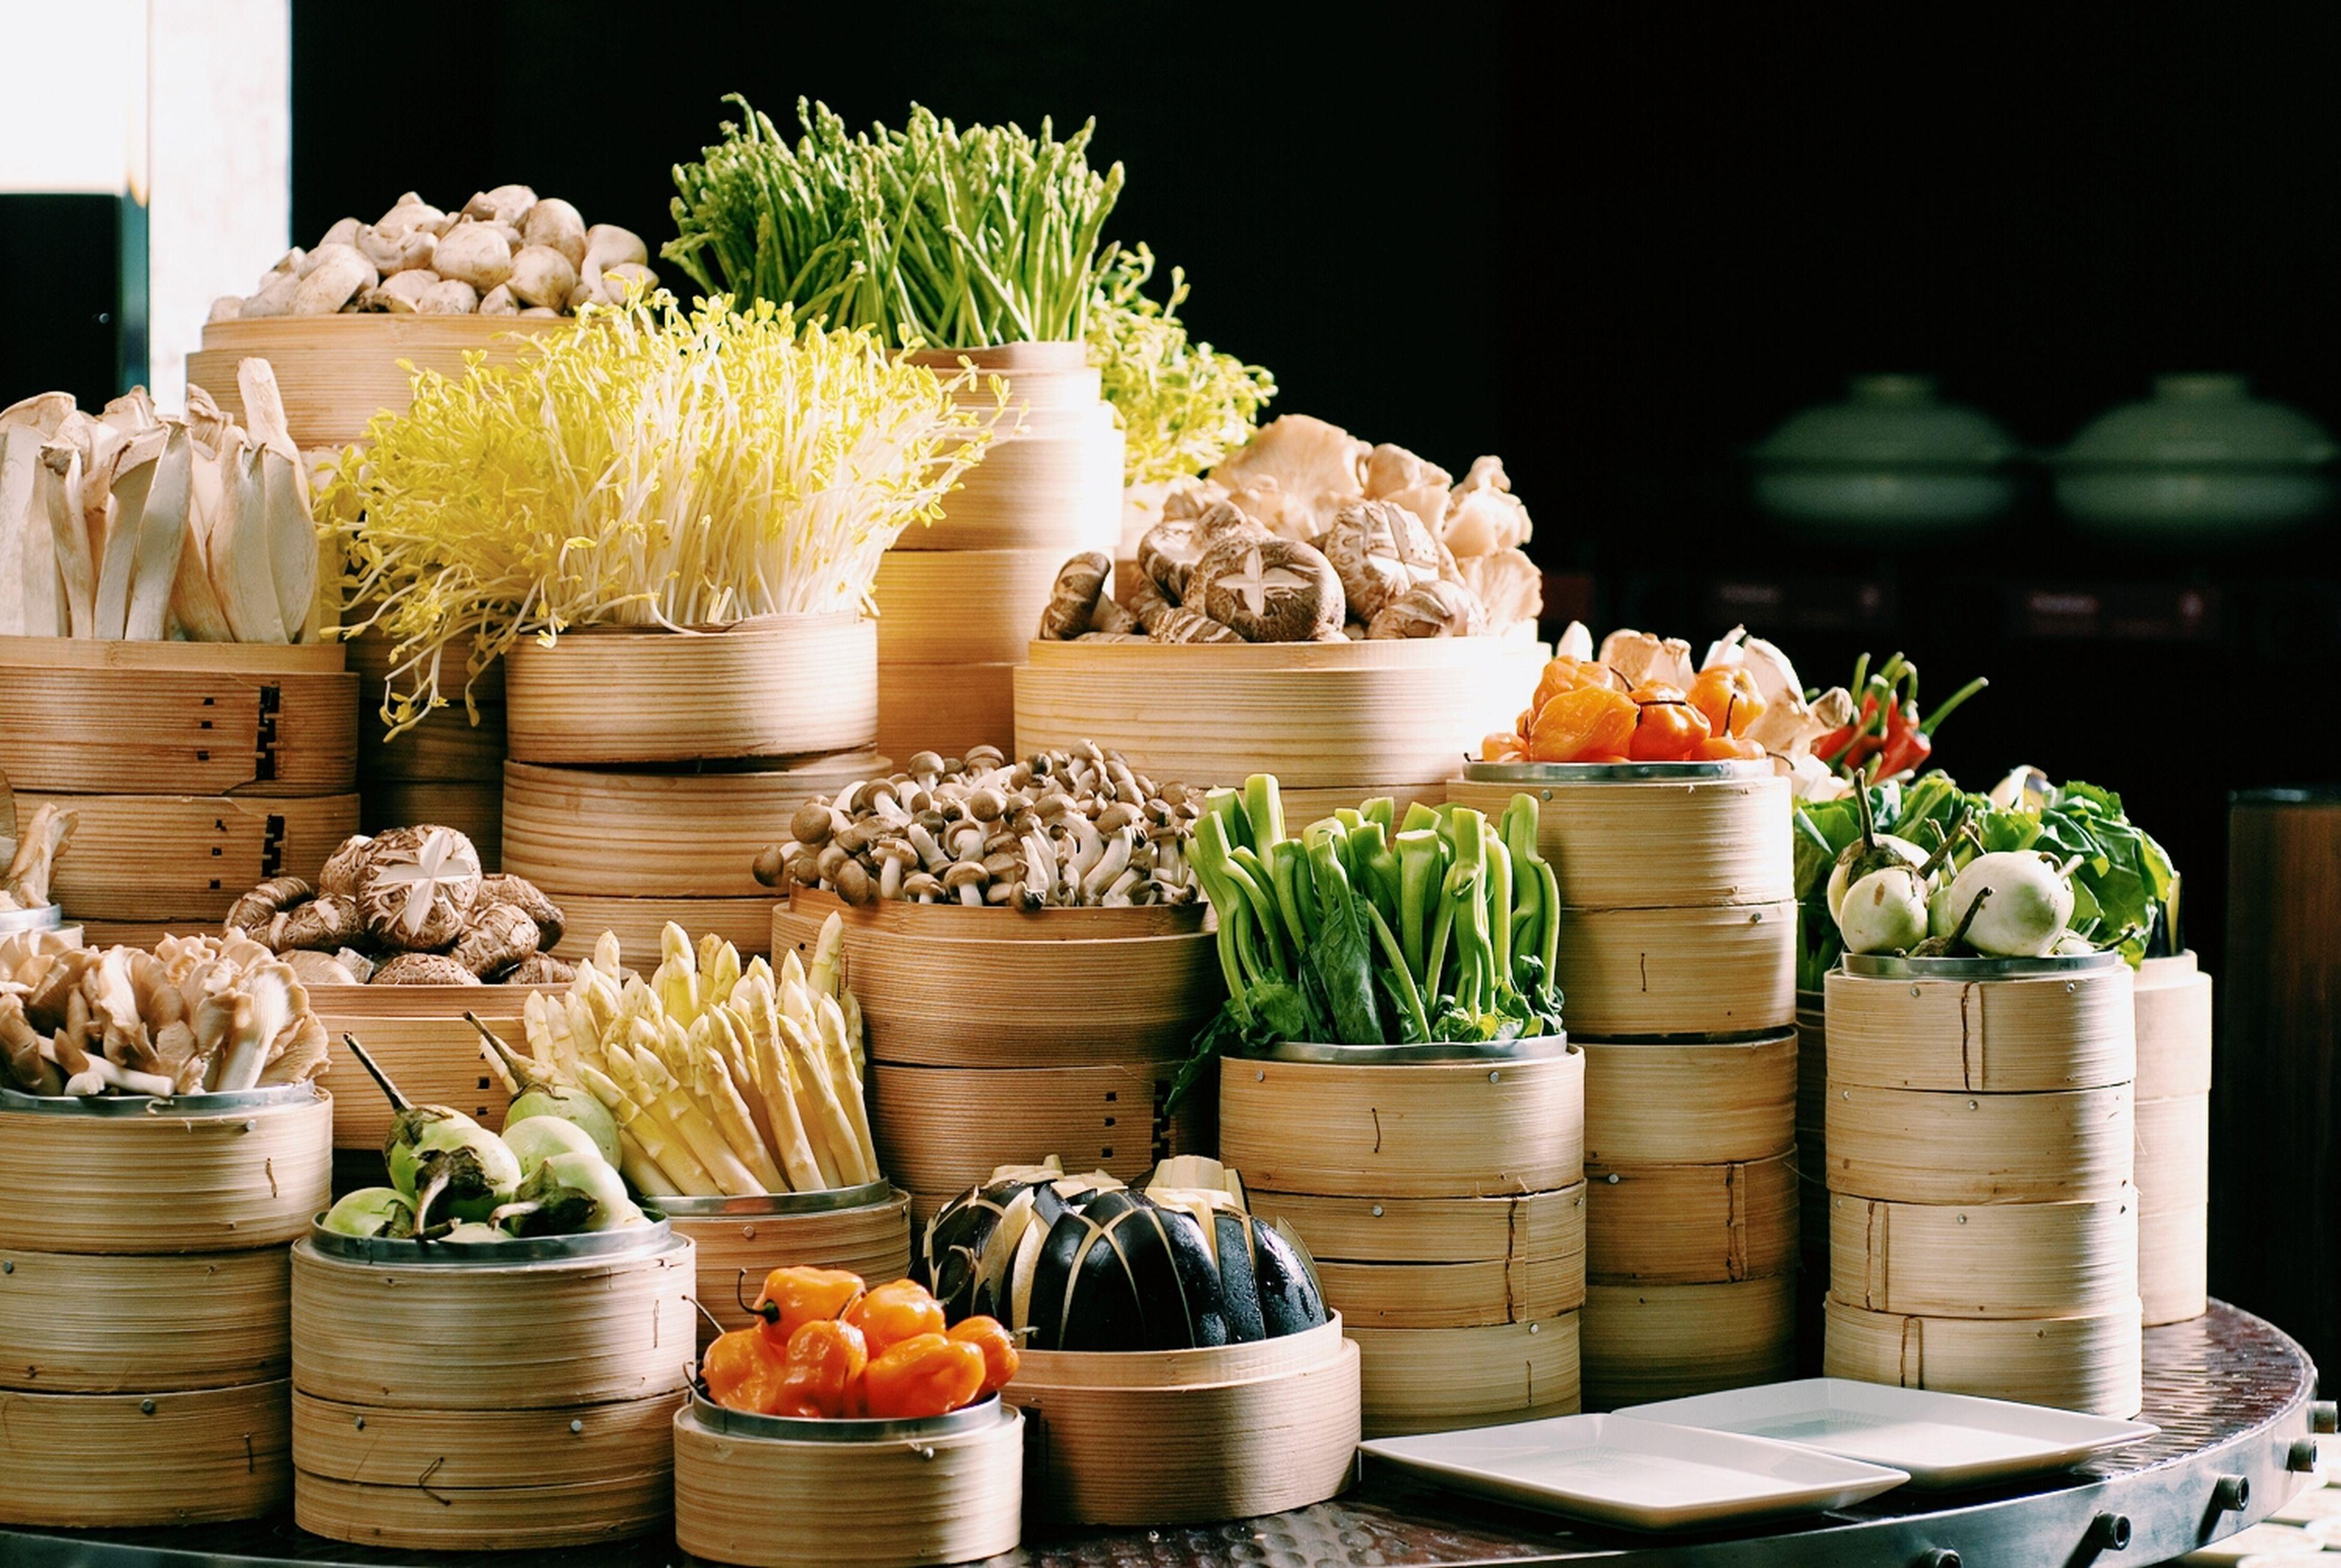 potted plant, freshness, variation, food and drink, for sale, choice, food, plant, retail, arrangement, indoors, healthy eating, flower, vegetable, table, growth, flower pot, basket, market, green color